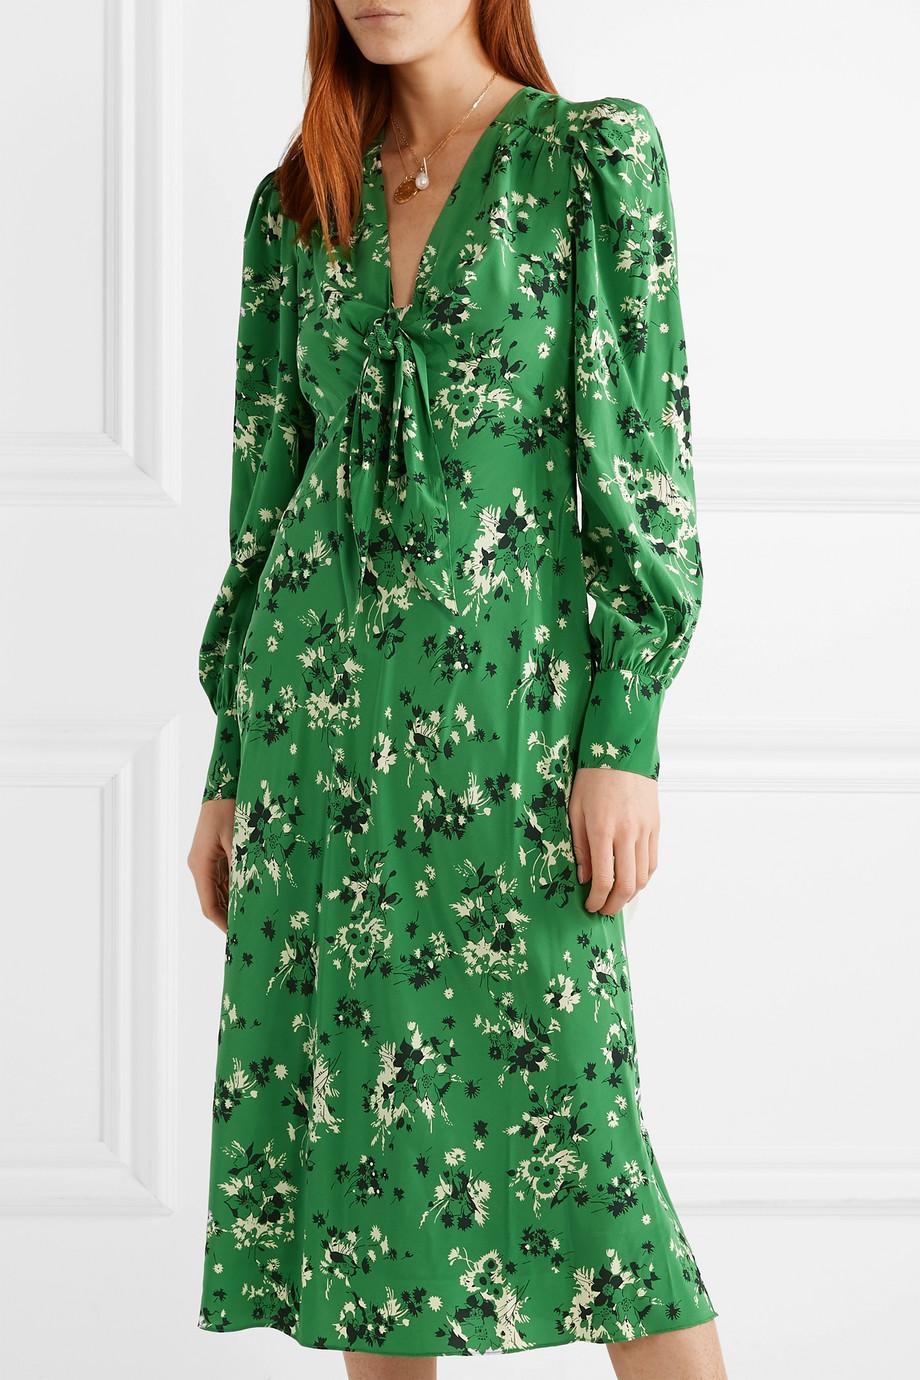 59deb9679 Veronica Beard Amber floral-print silk-blend midi dress